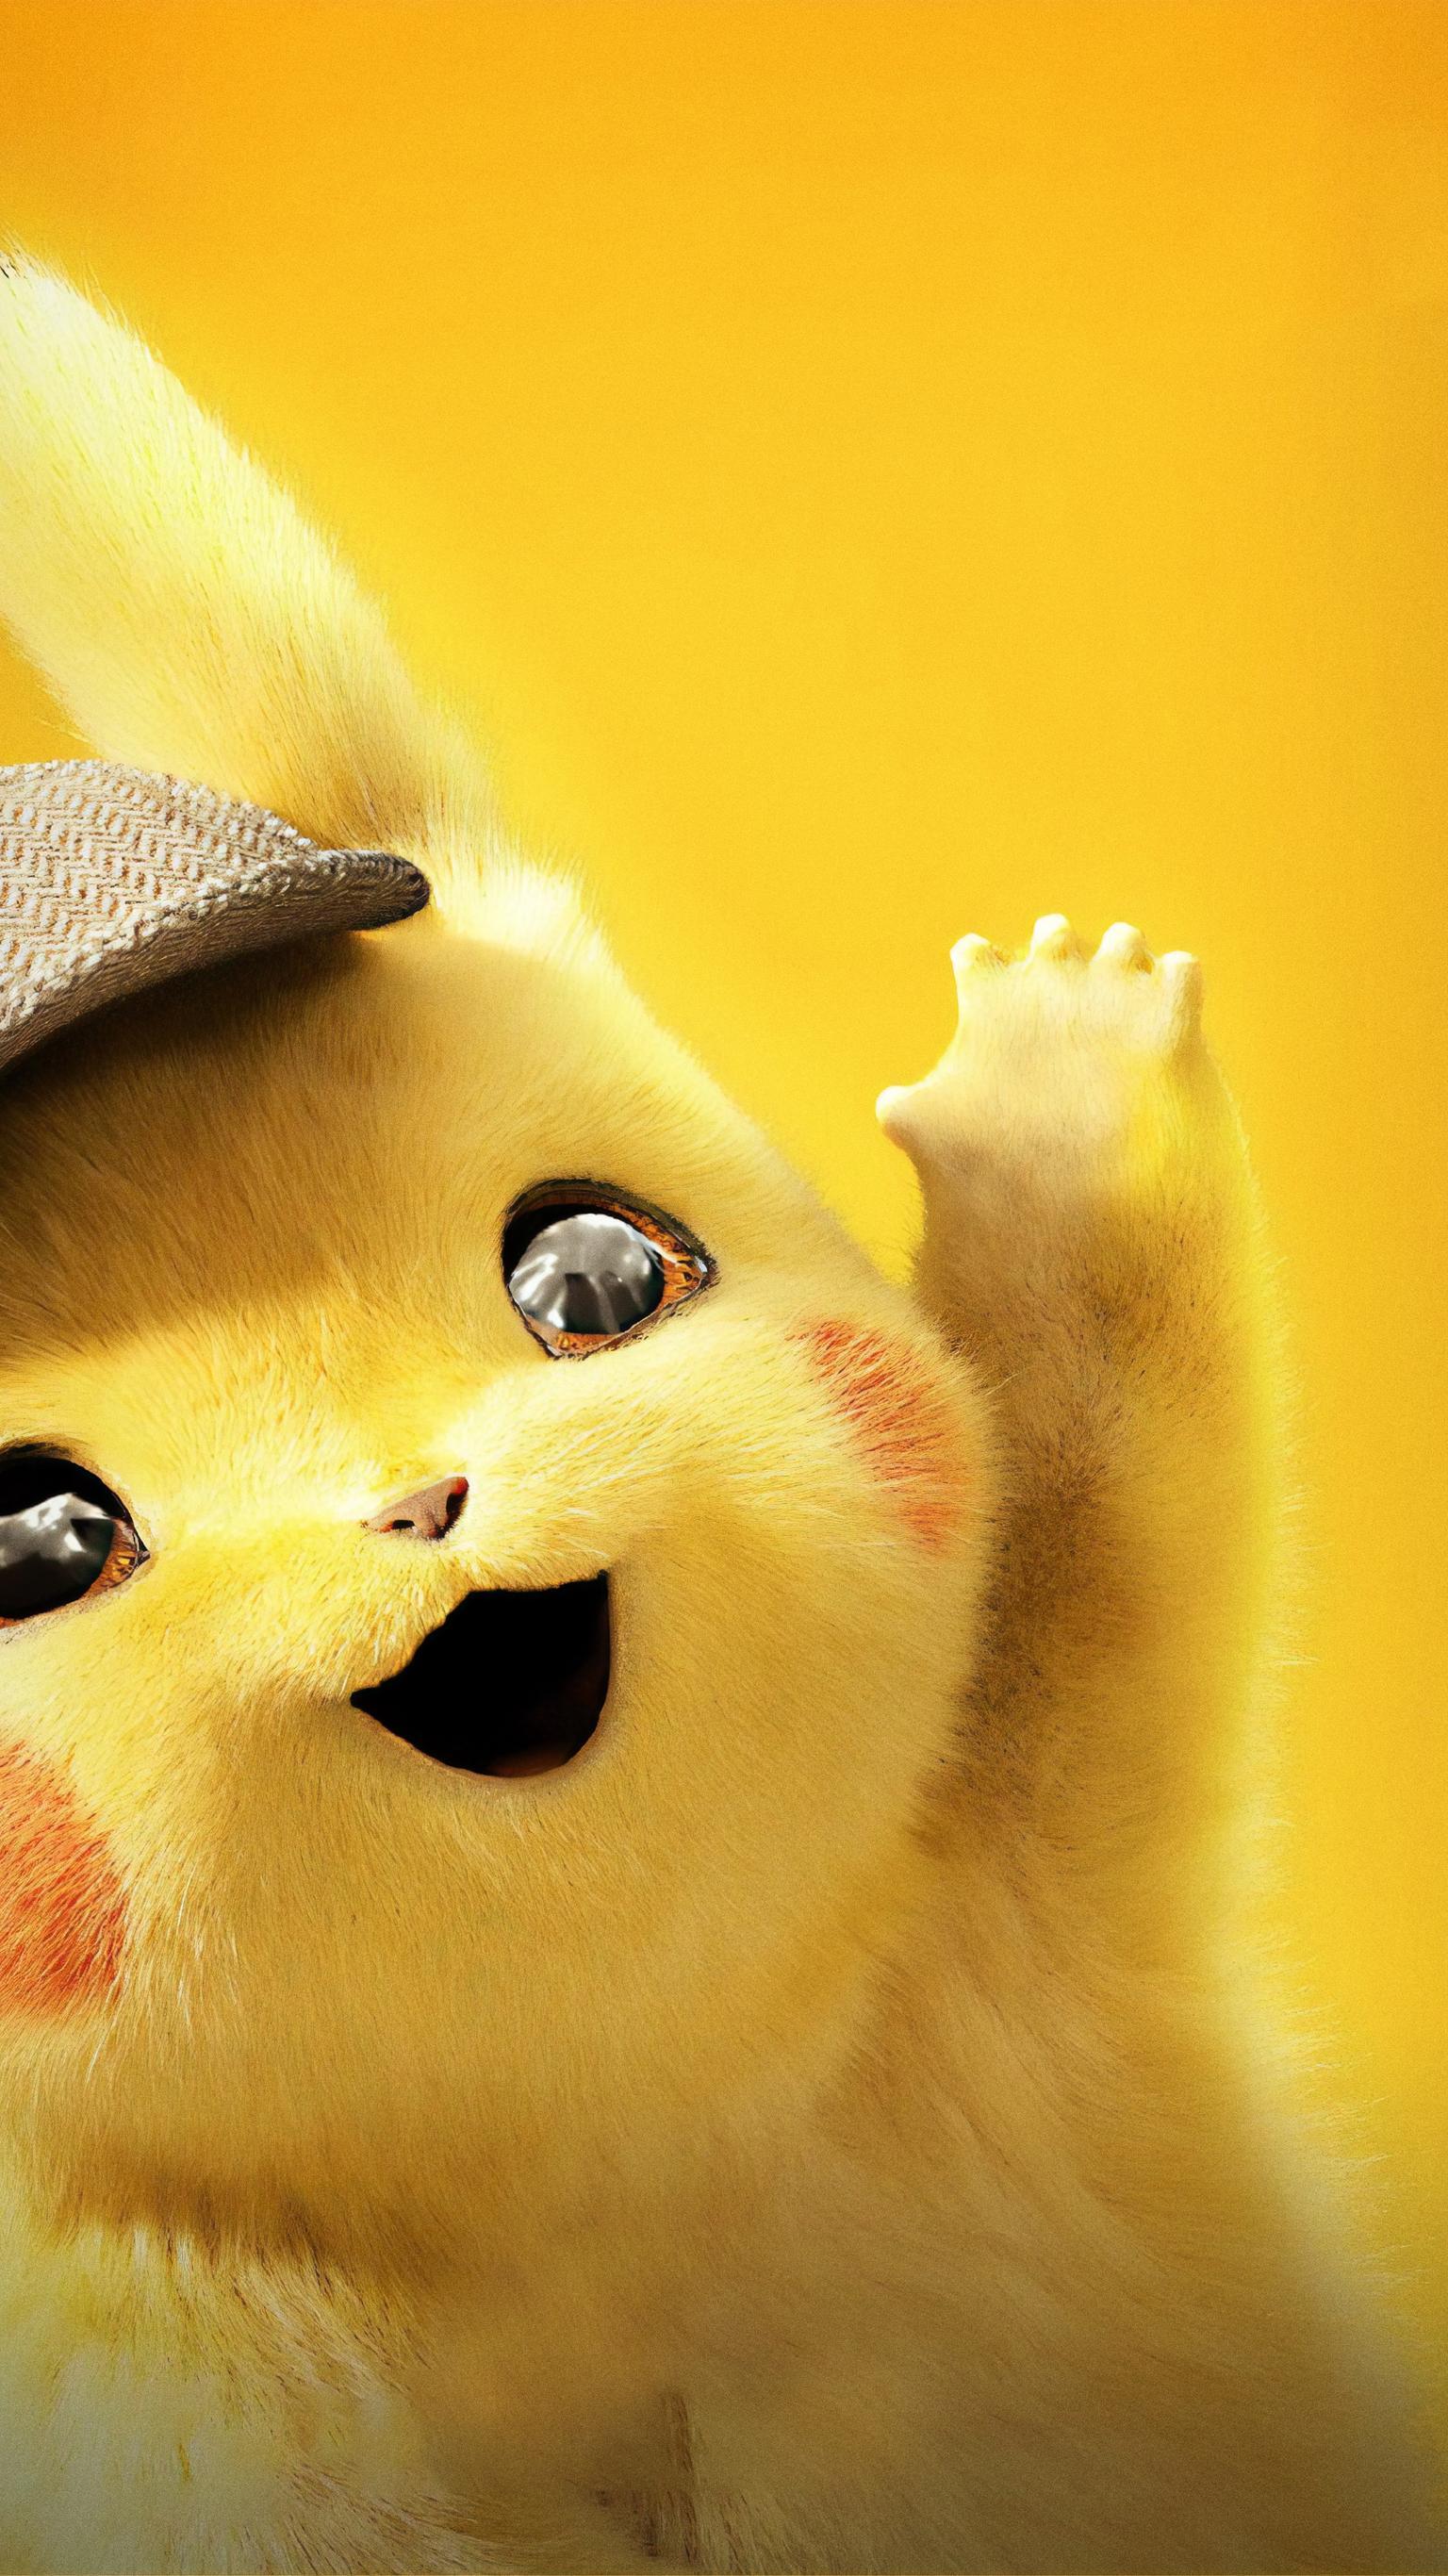 Pikachu Full Hd Iphone Wallpapers Wallpaper Cave